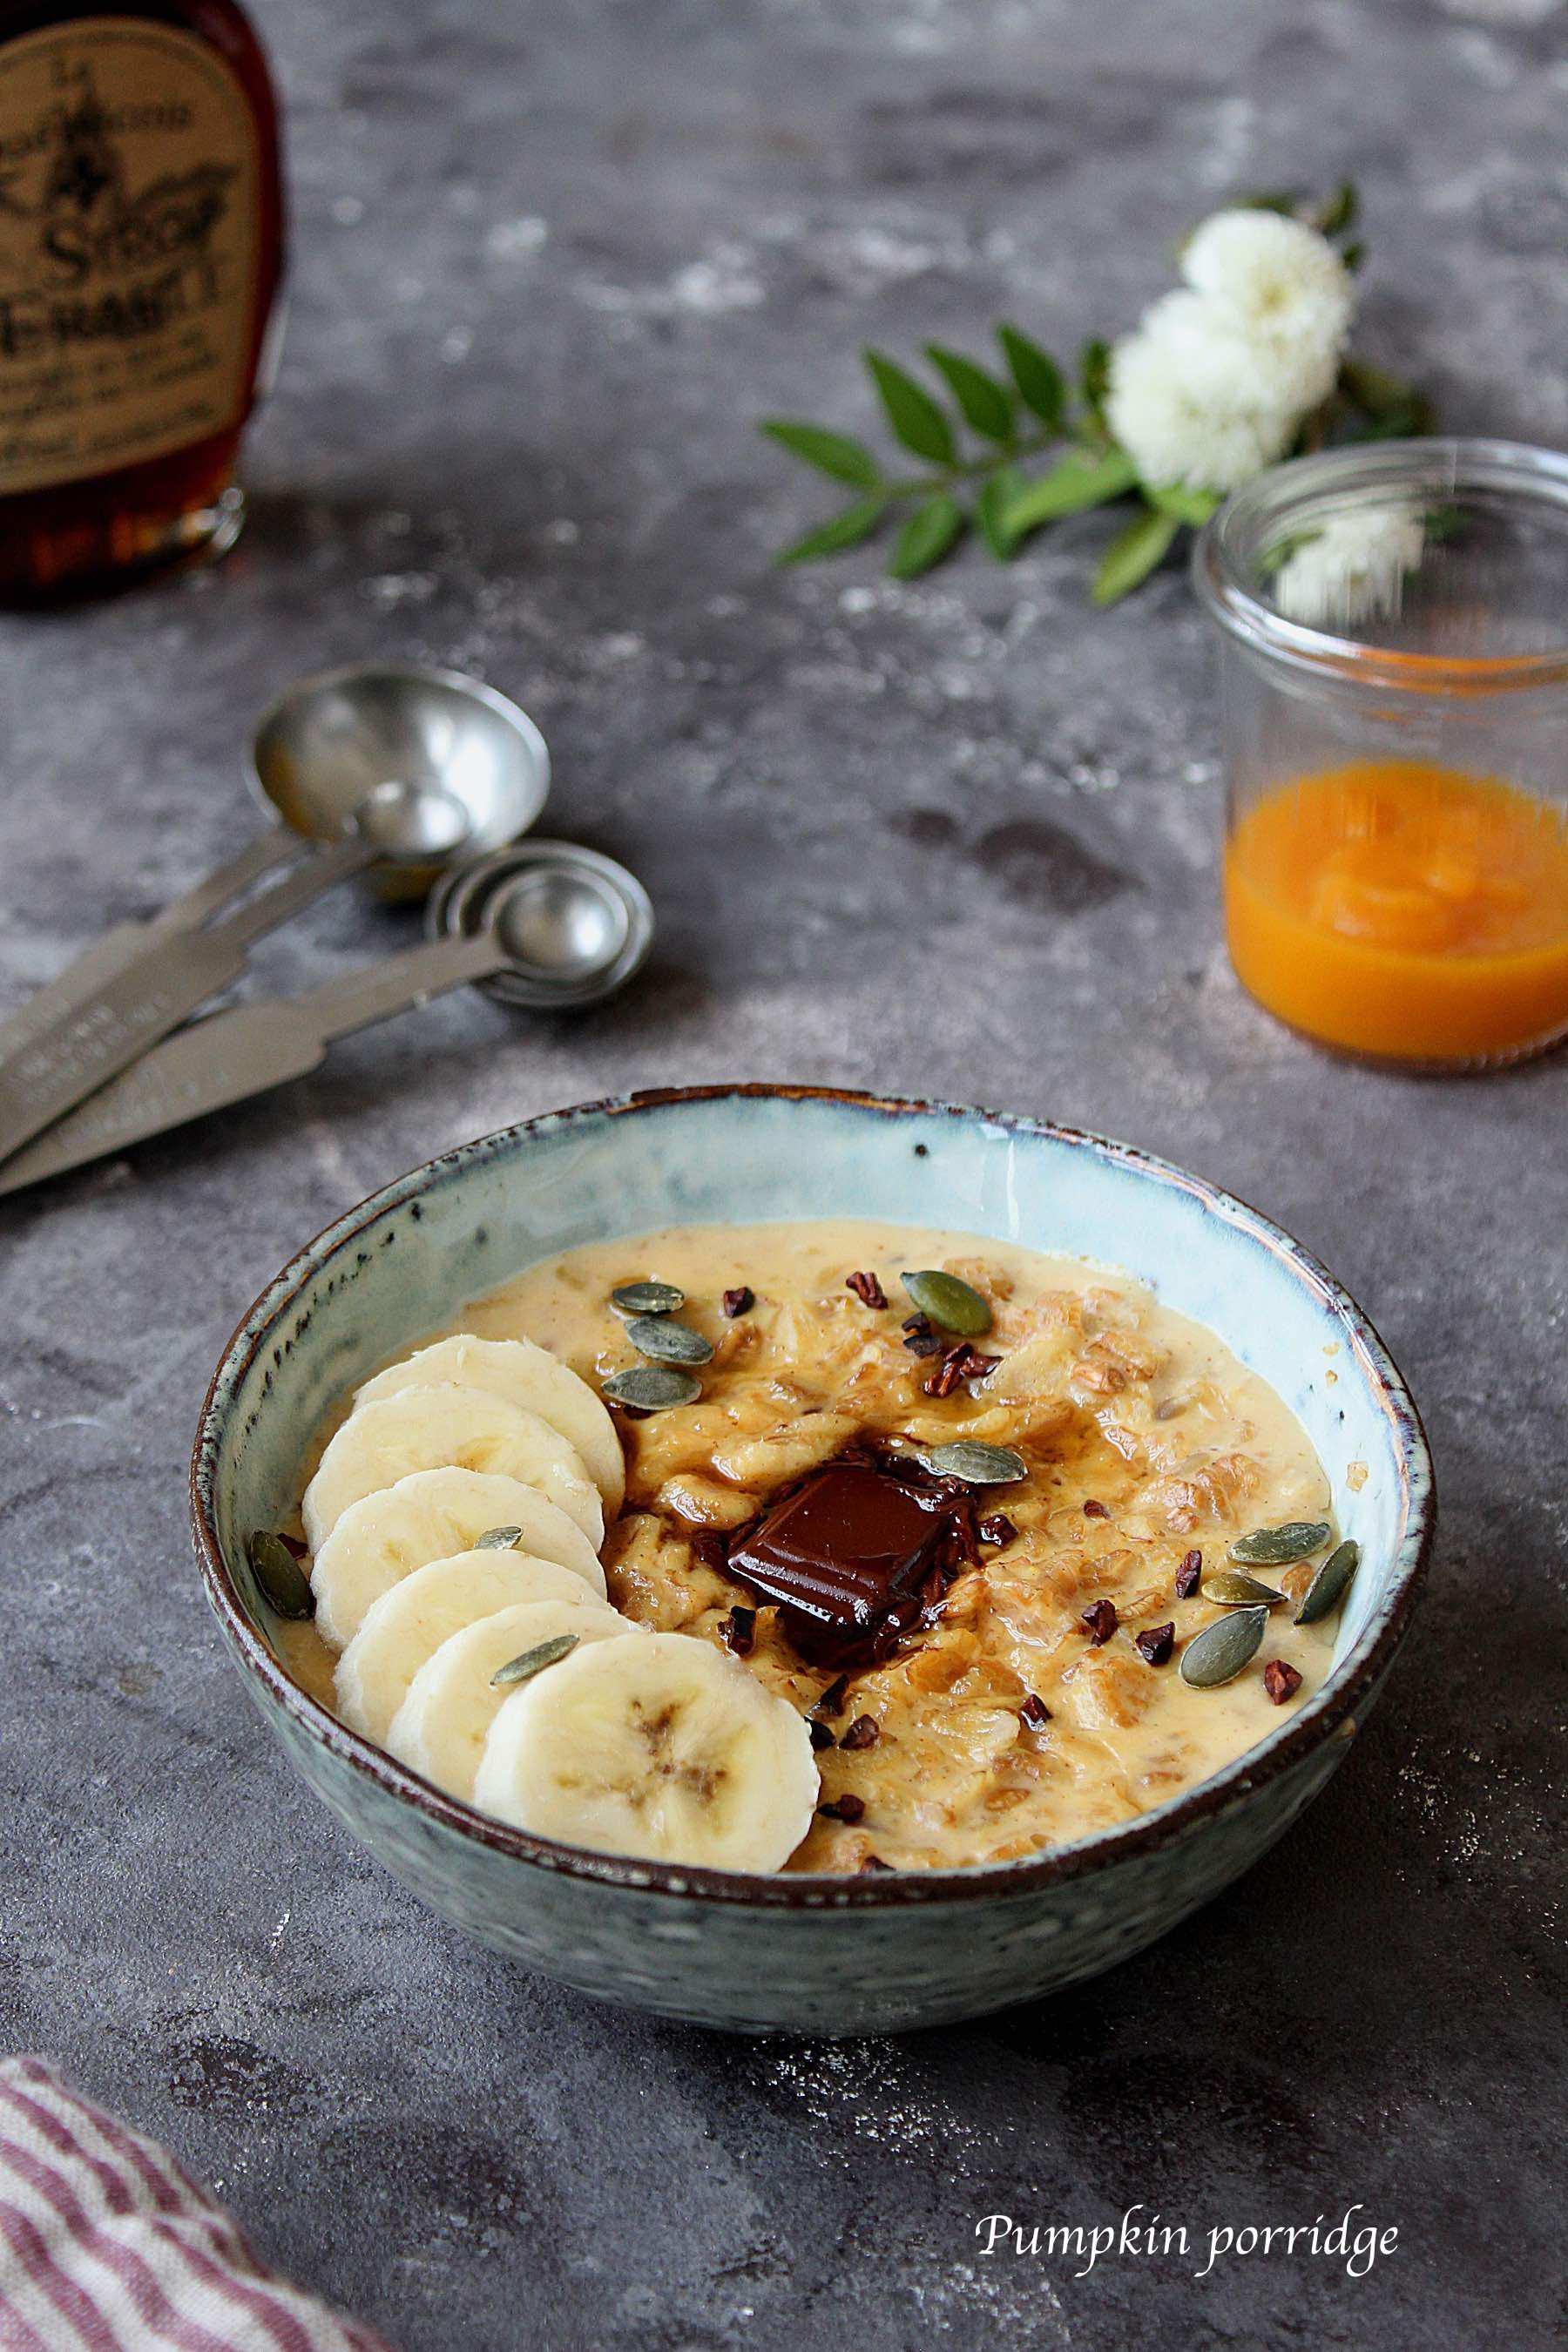 Pumpkin and maple syrup porridge